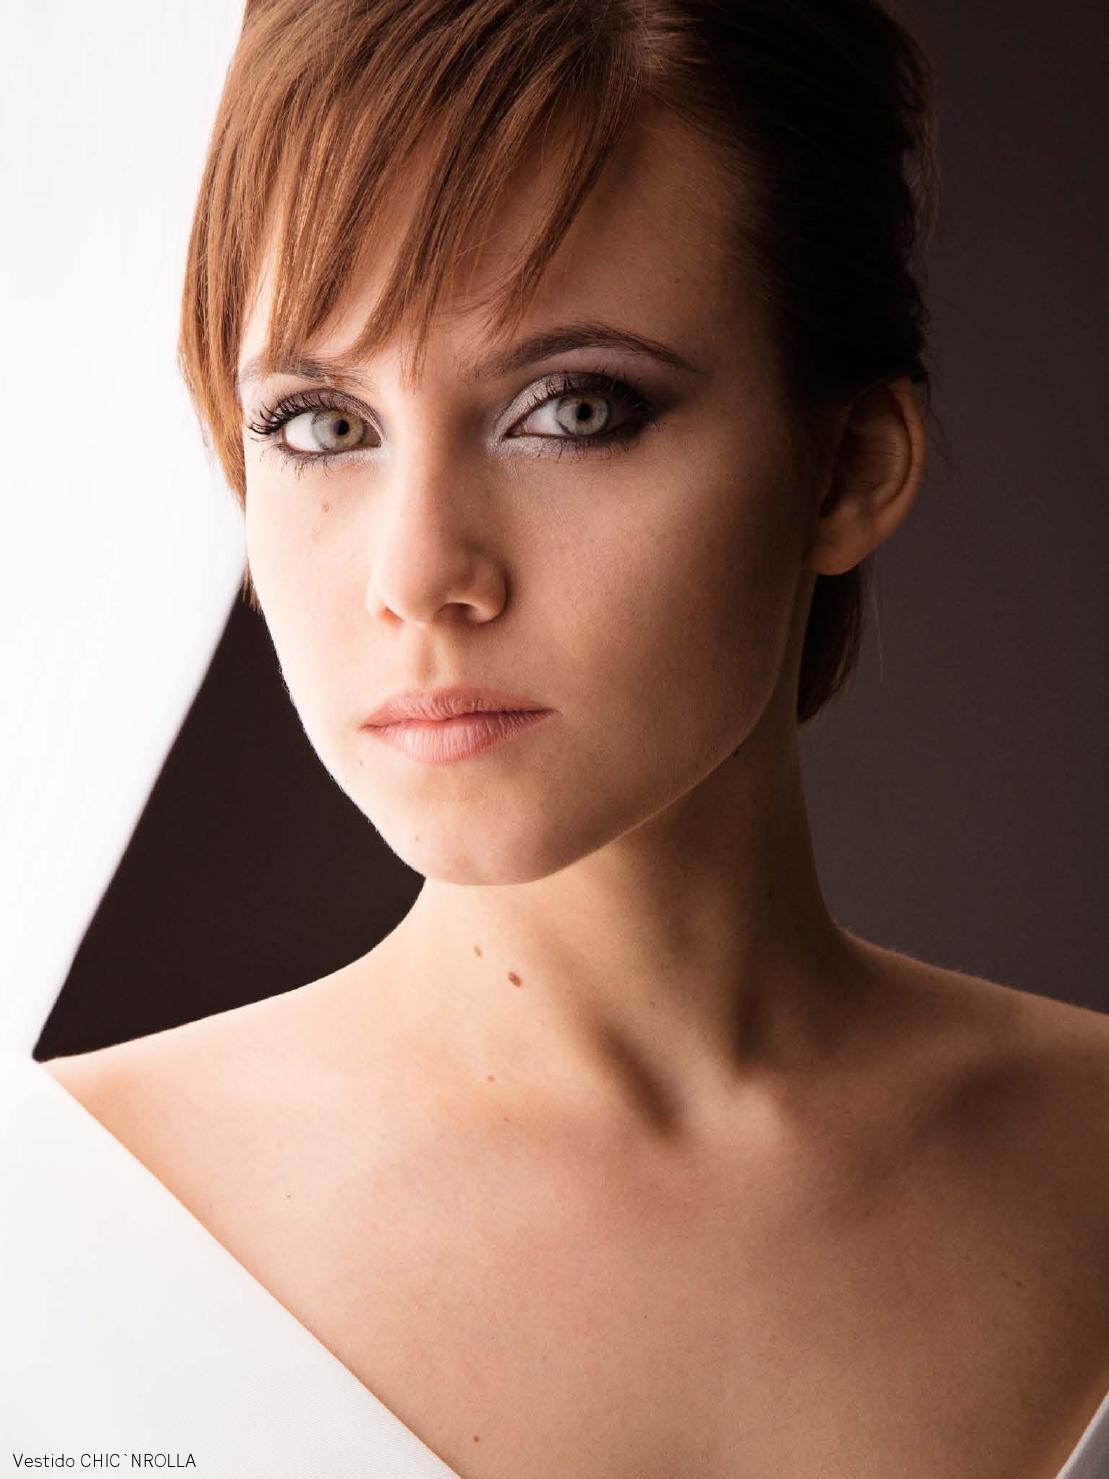 Aura Garrido Nude aura garrido nude, naked - pics and videos - imperiodefamosas